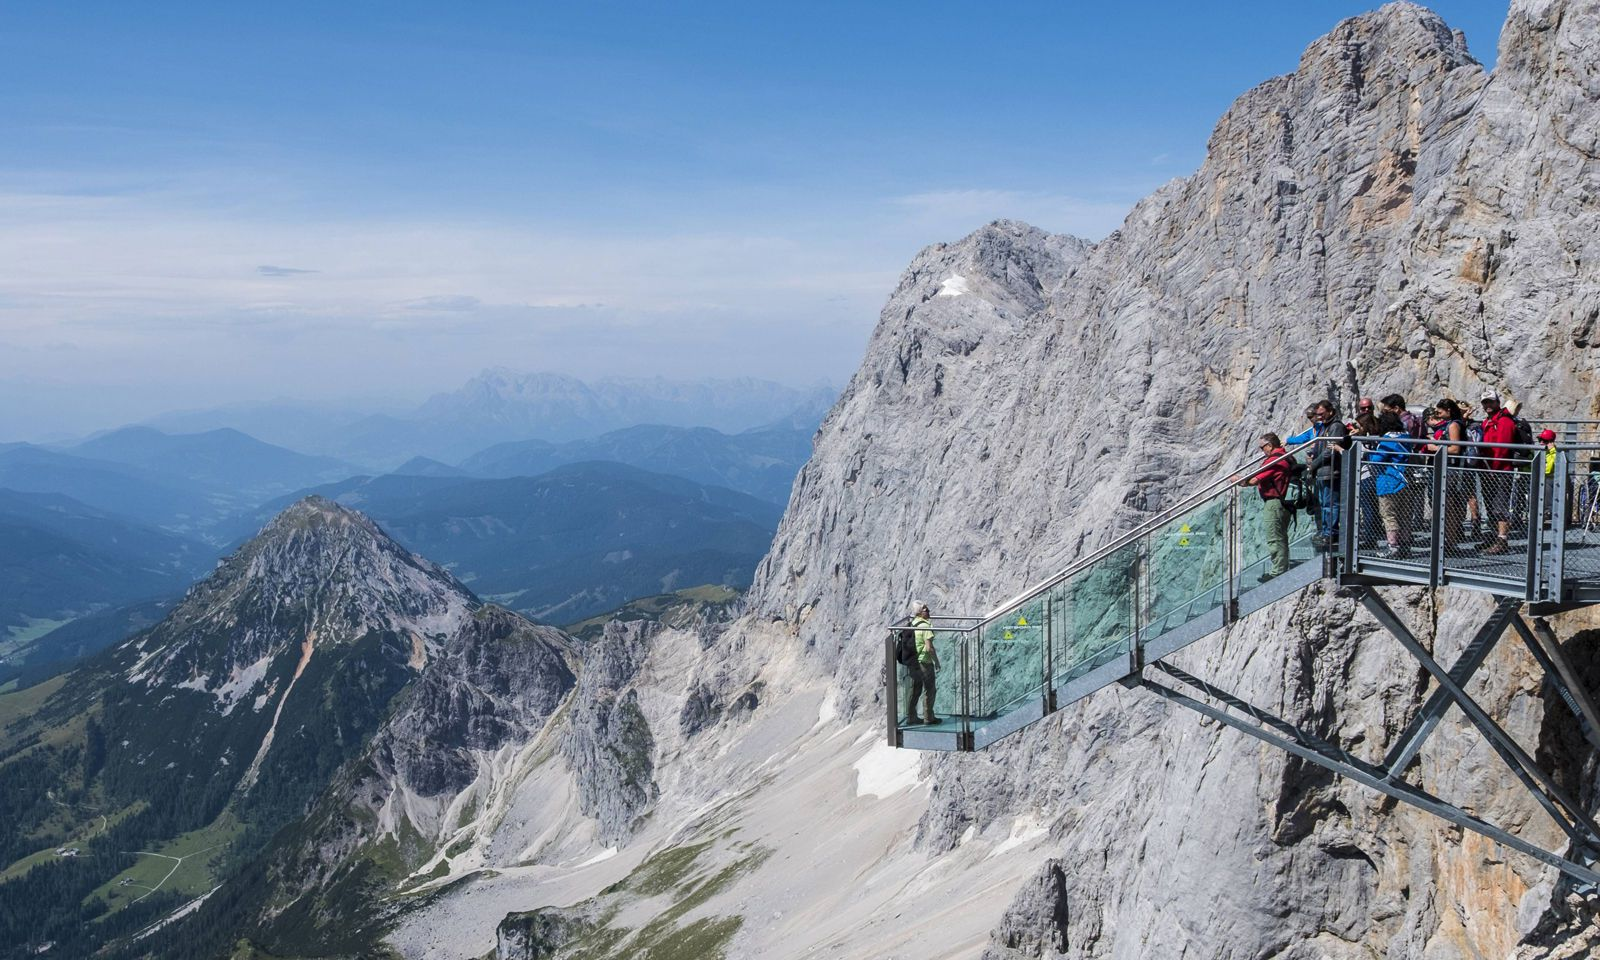 The Path To Nothingness on the Hoher Dachstein in Austria PUBLICATIONxINxGERxSUIxAUTxONLY Copyright